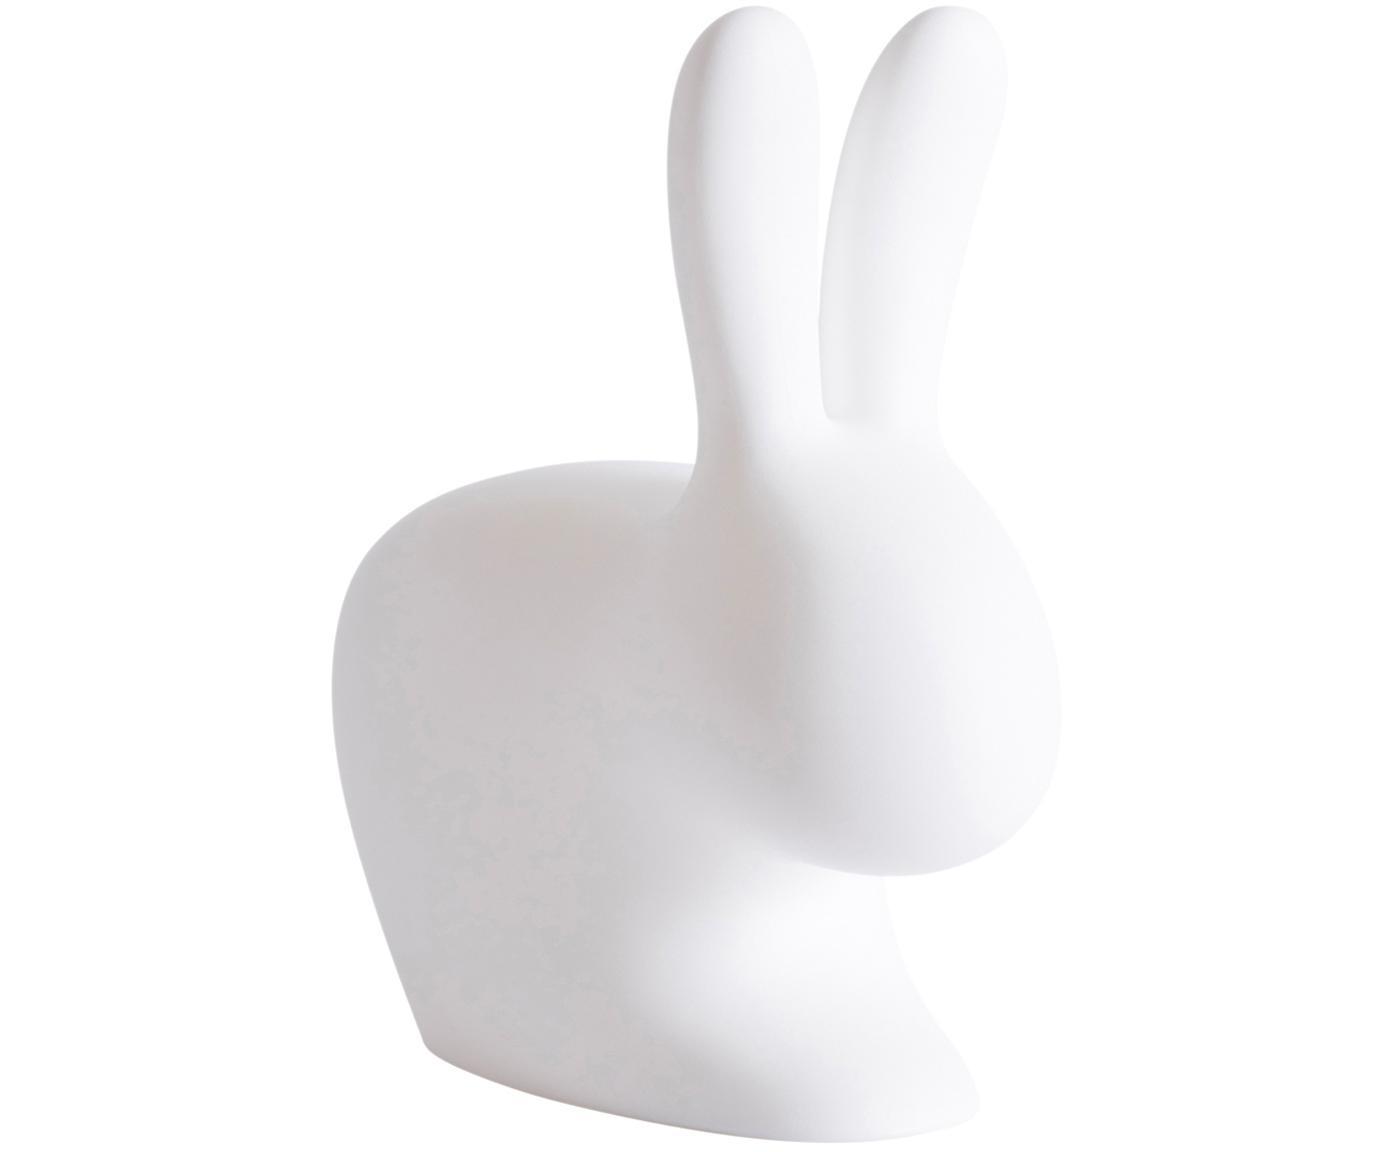 Lámpara de mesa LED de exterior Rabbit, Plástico (polietileno), Blanco, An 45 x Al 53 cm